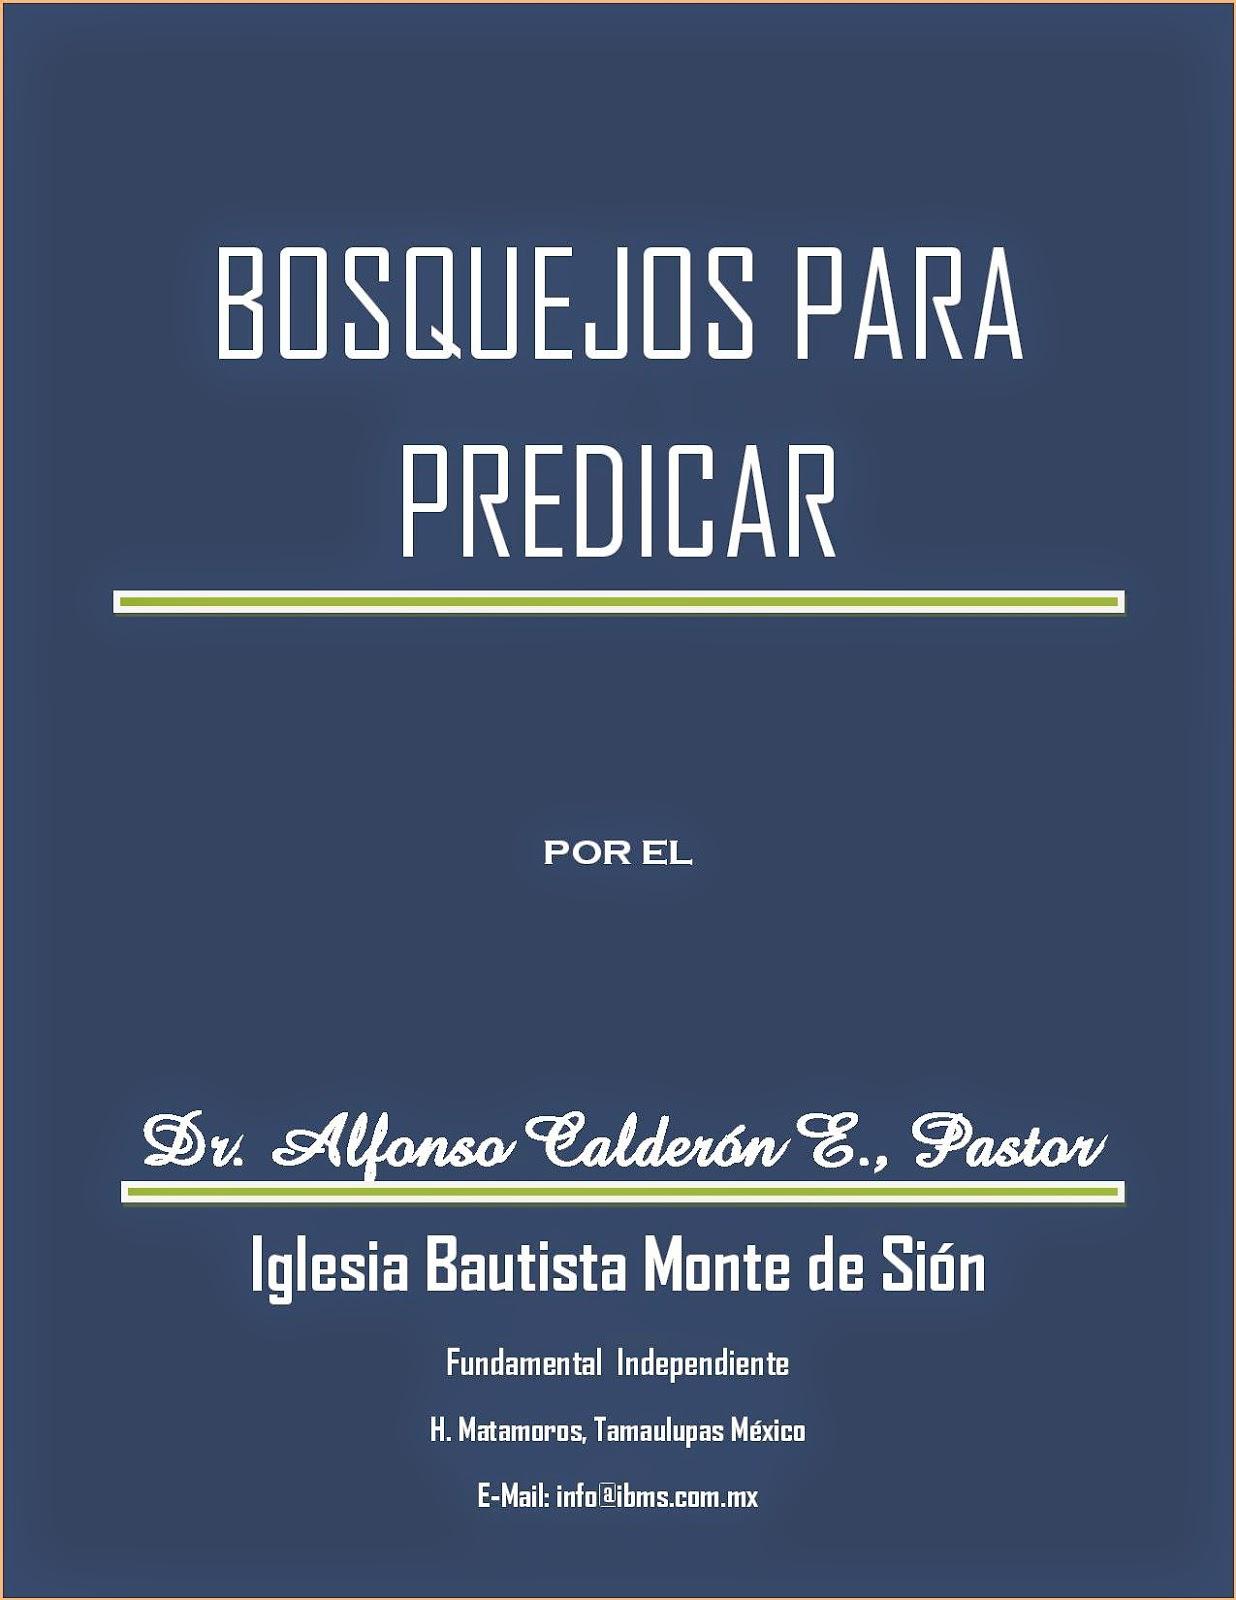 Alfonso Calderón-Bosquejos Para Predicar-